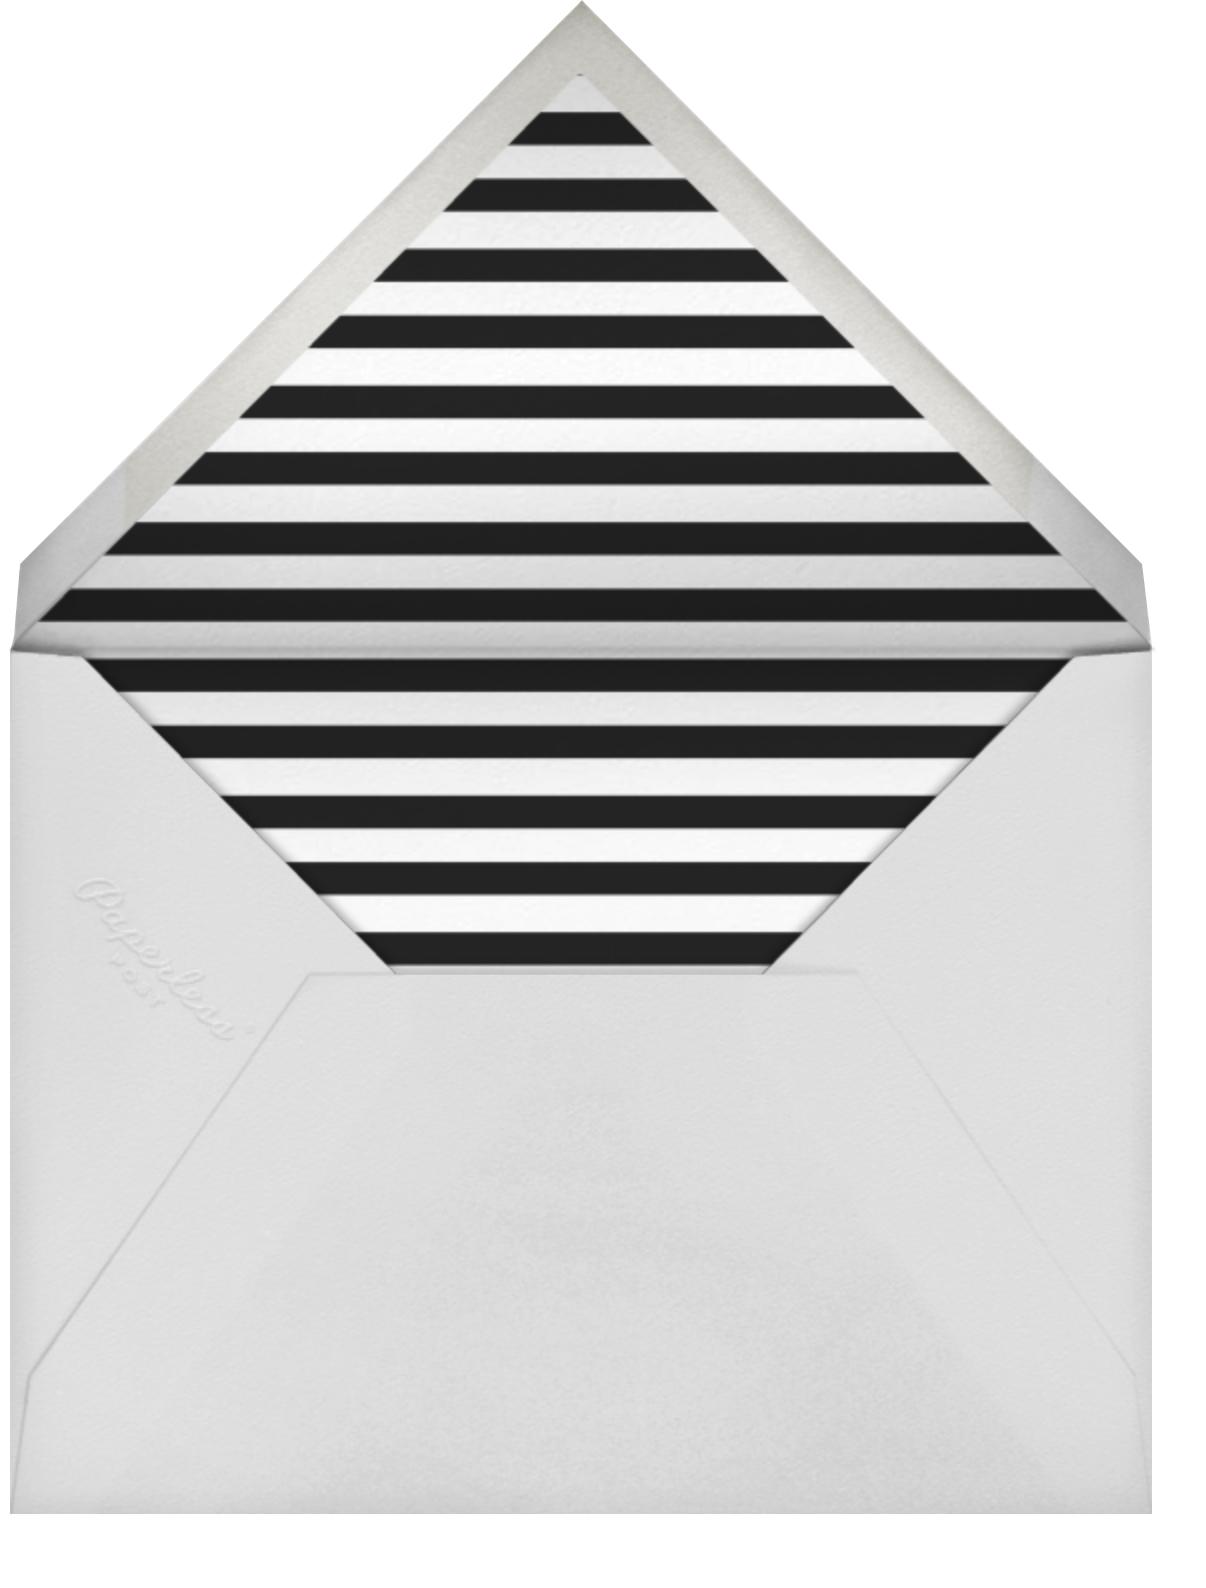 Confetti Shimmer - kate spade new york - Adult birthday - envelope back